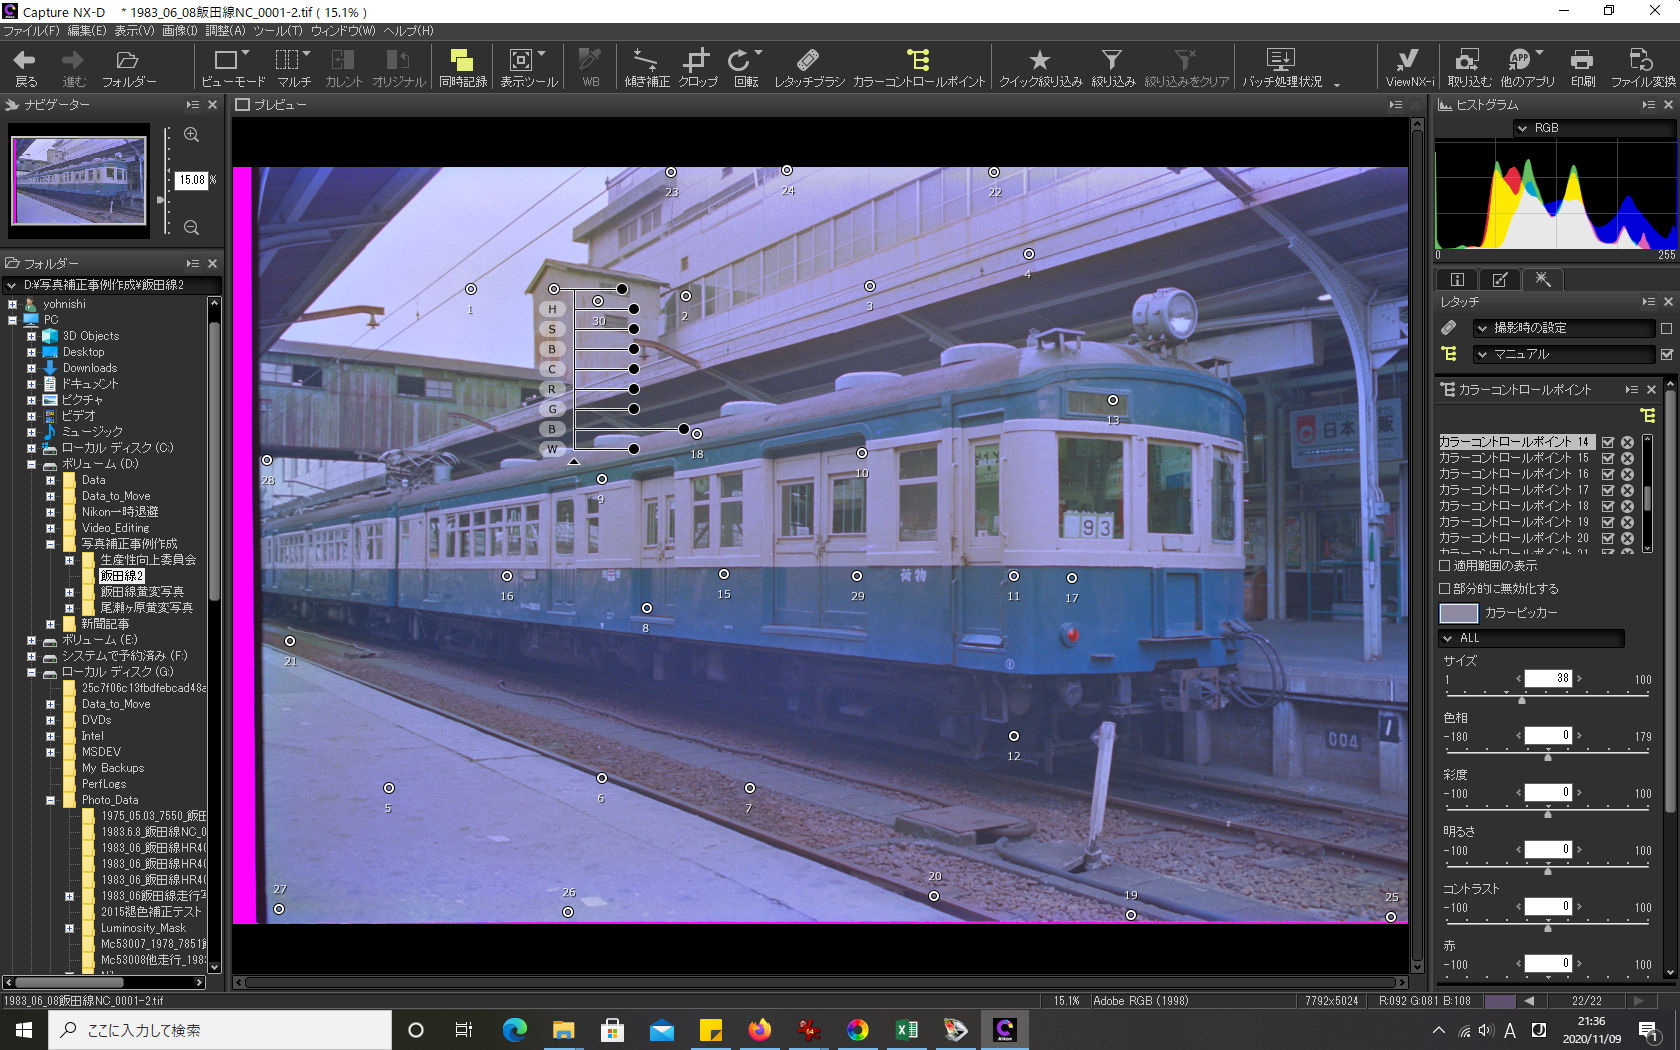 f:id:yasuo_ssi:20201109213747j:plain